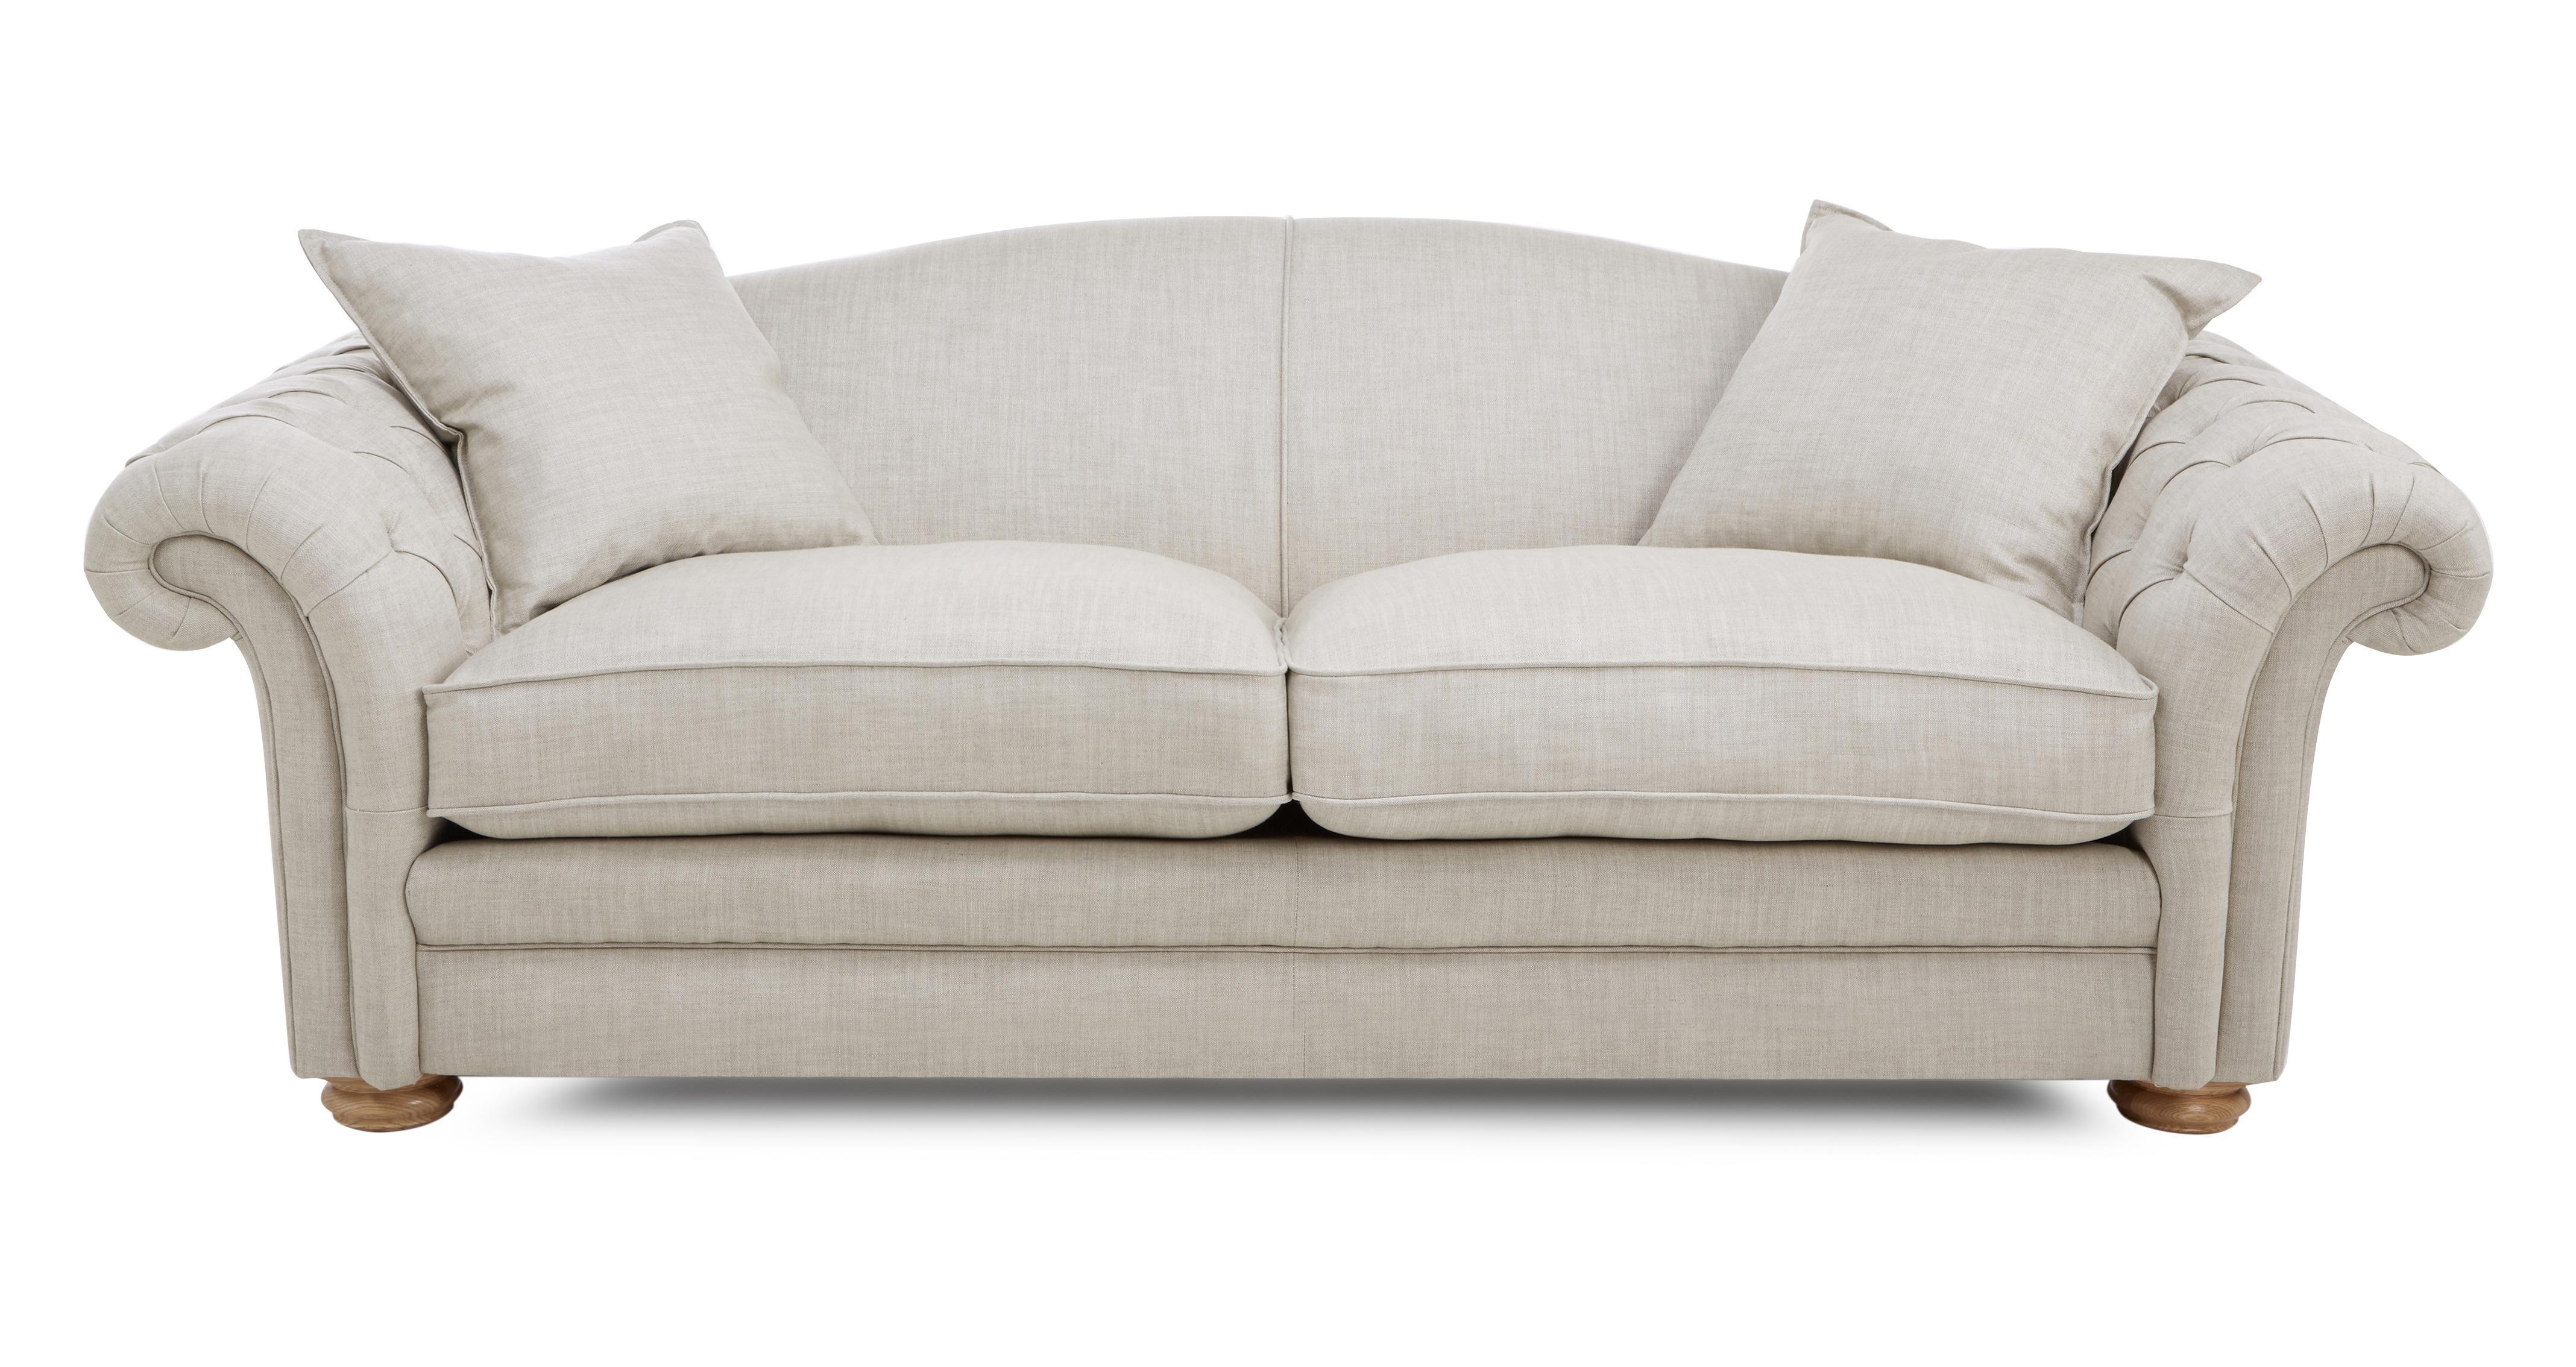 Loch Leven Plain Pillow Back 4 Seater Sofa Meadow Plain Dfs